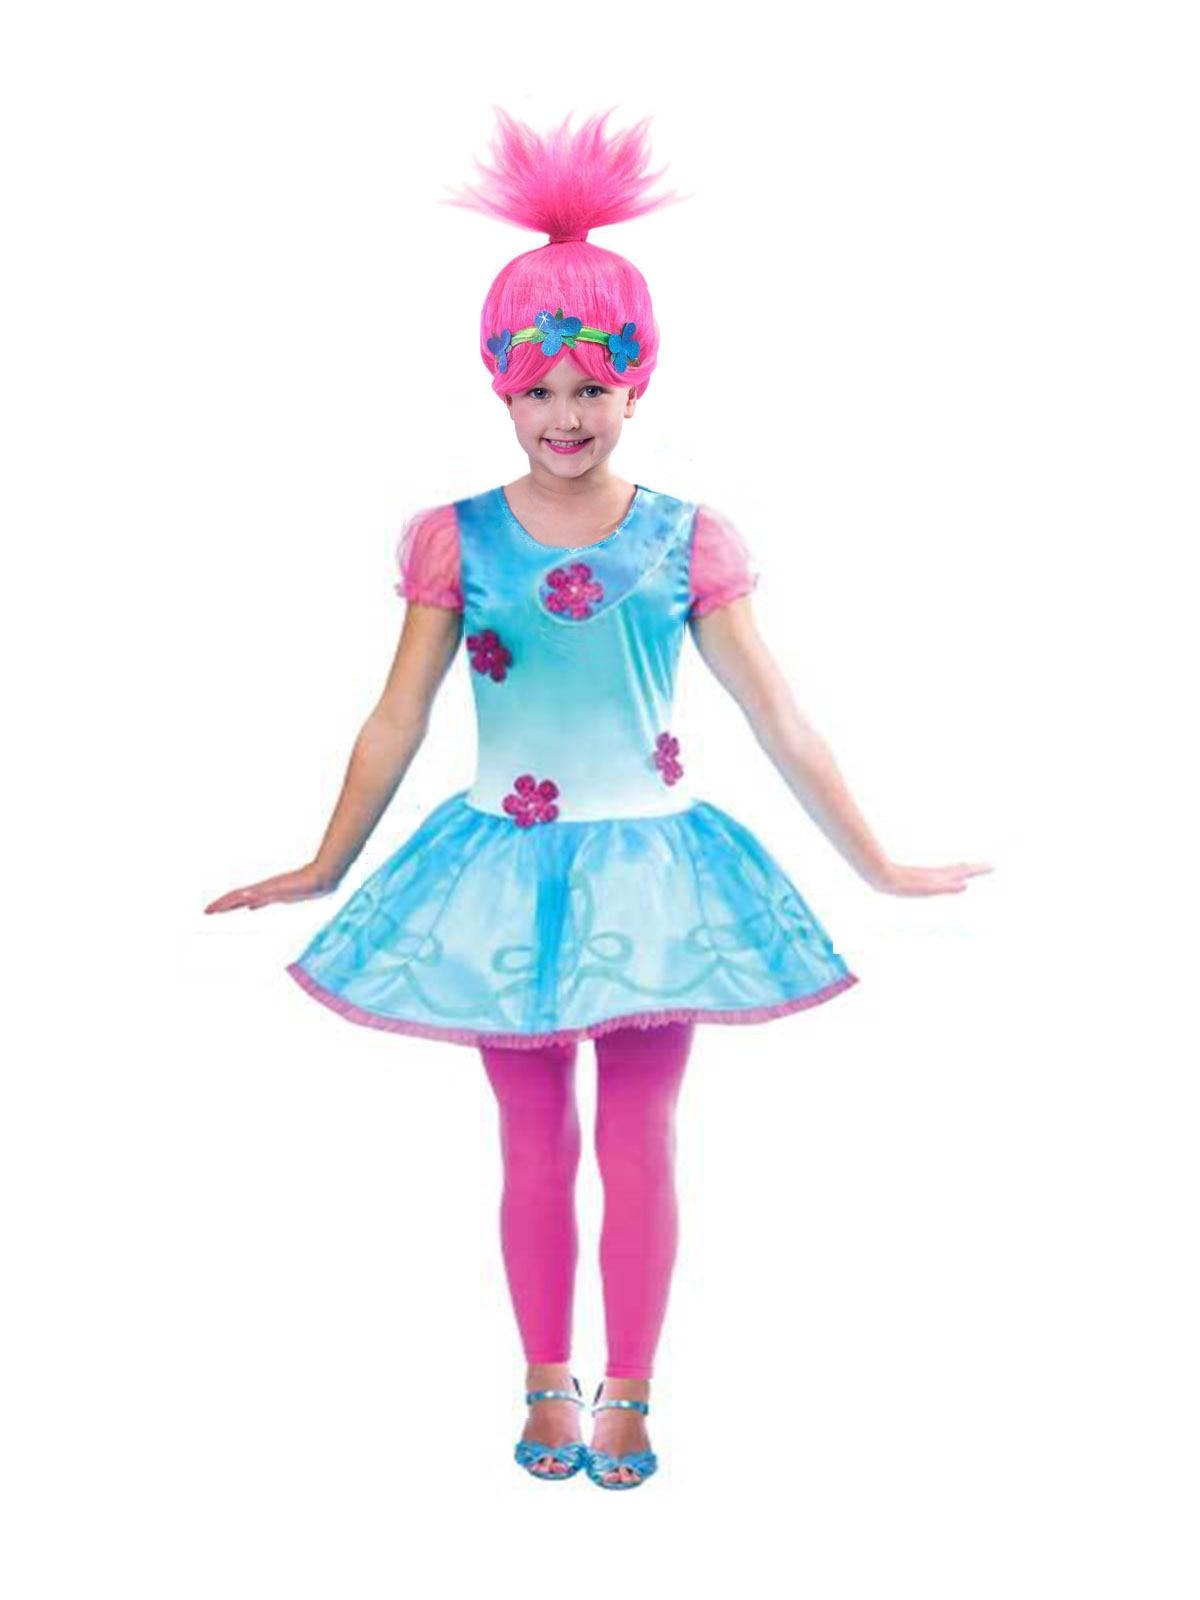 2018 ano novo trolls papoula cosplay trajes vestidos para meninas bobo vestido de natal roupas da menina do bebê crianças fantasia vestido & peruca conjunto